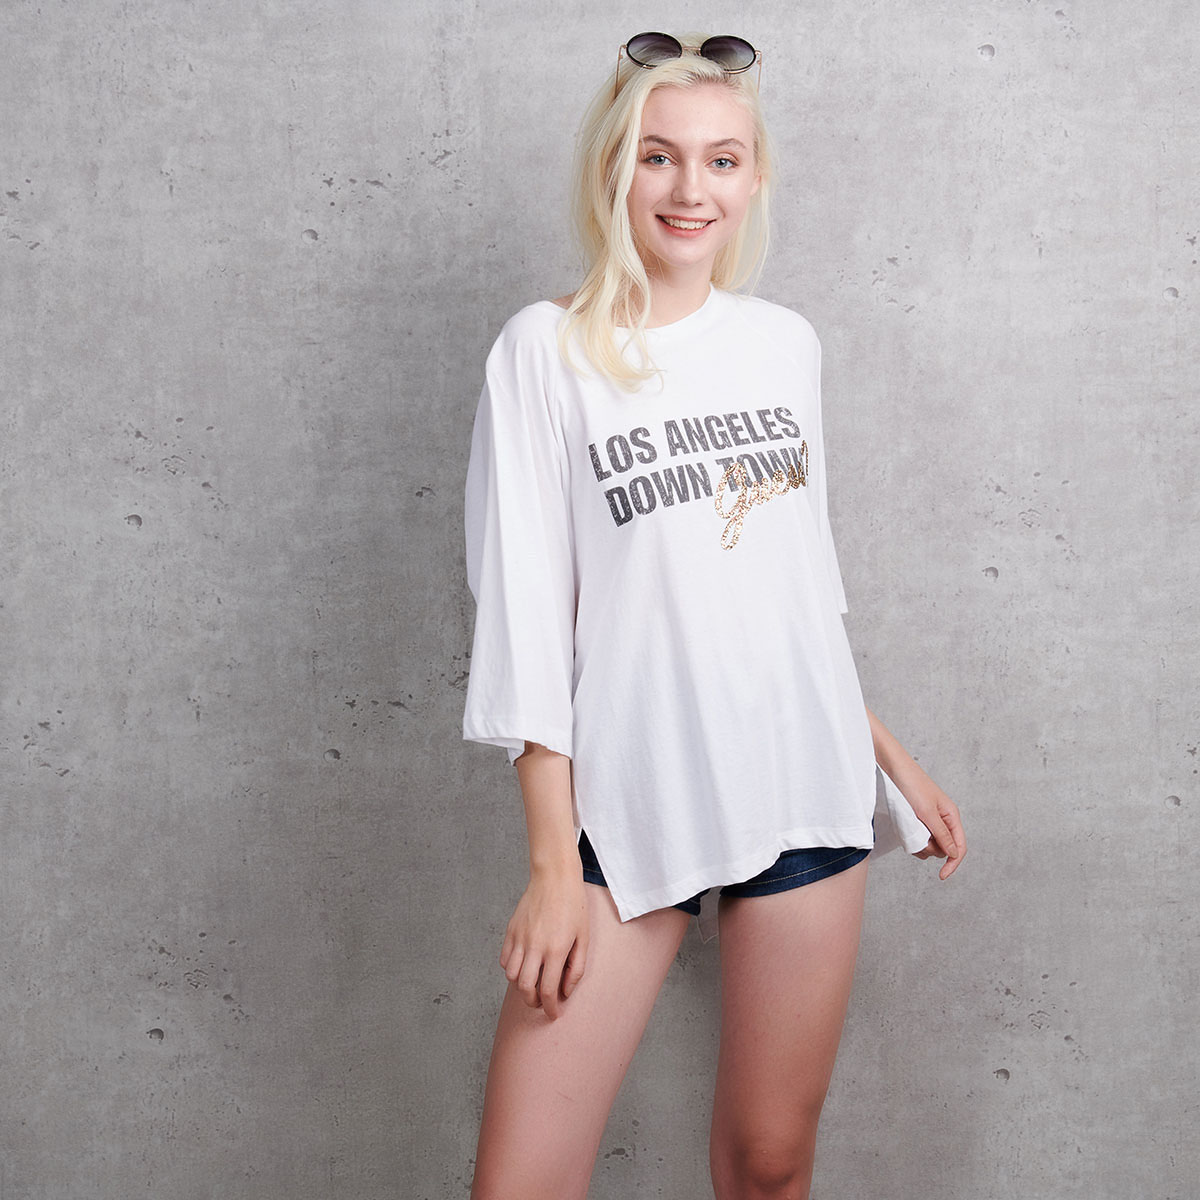 GUESS女士女装精品偏薄偏软宽松上衣短袖T恤YI2K1421-WHT